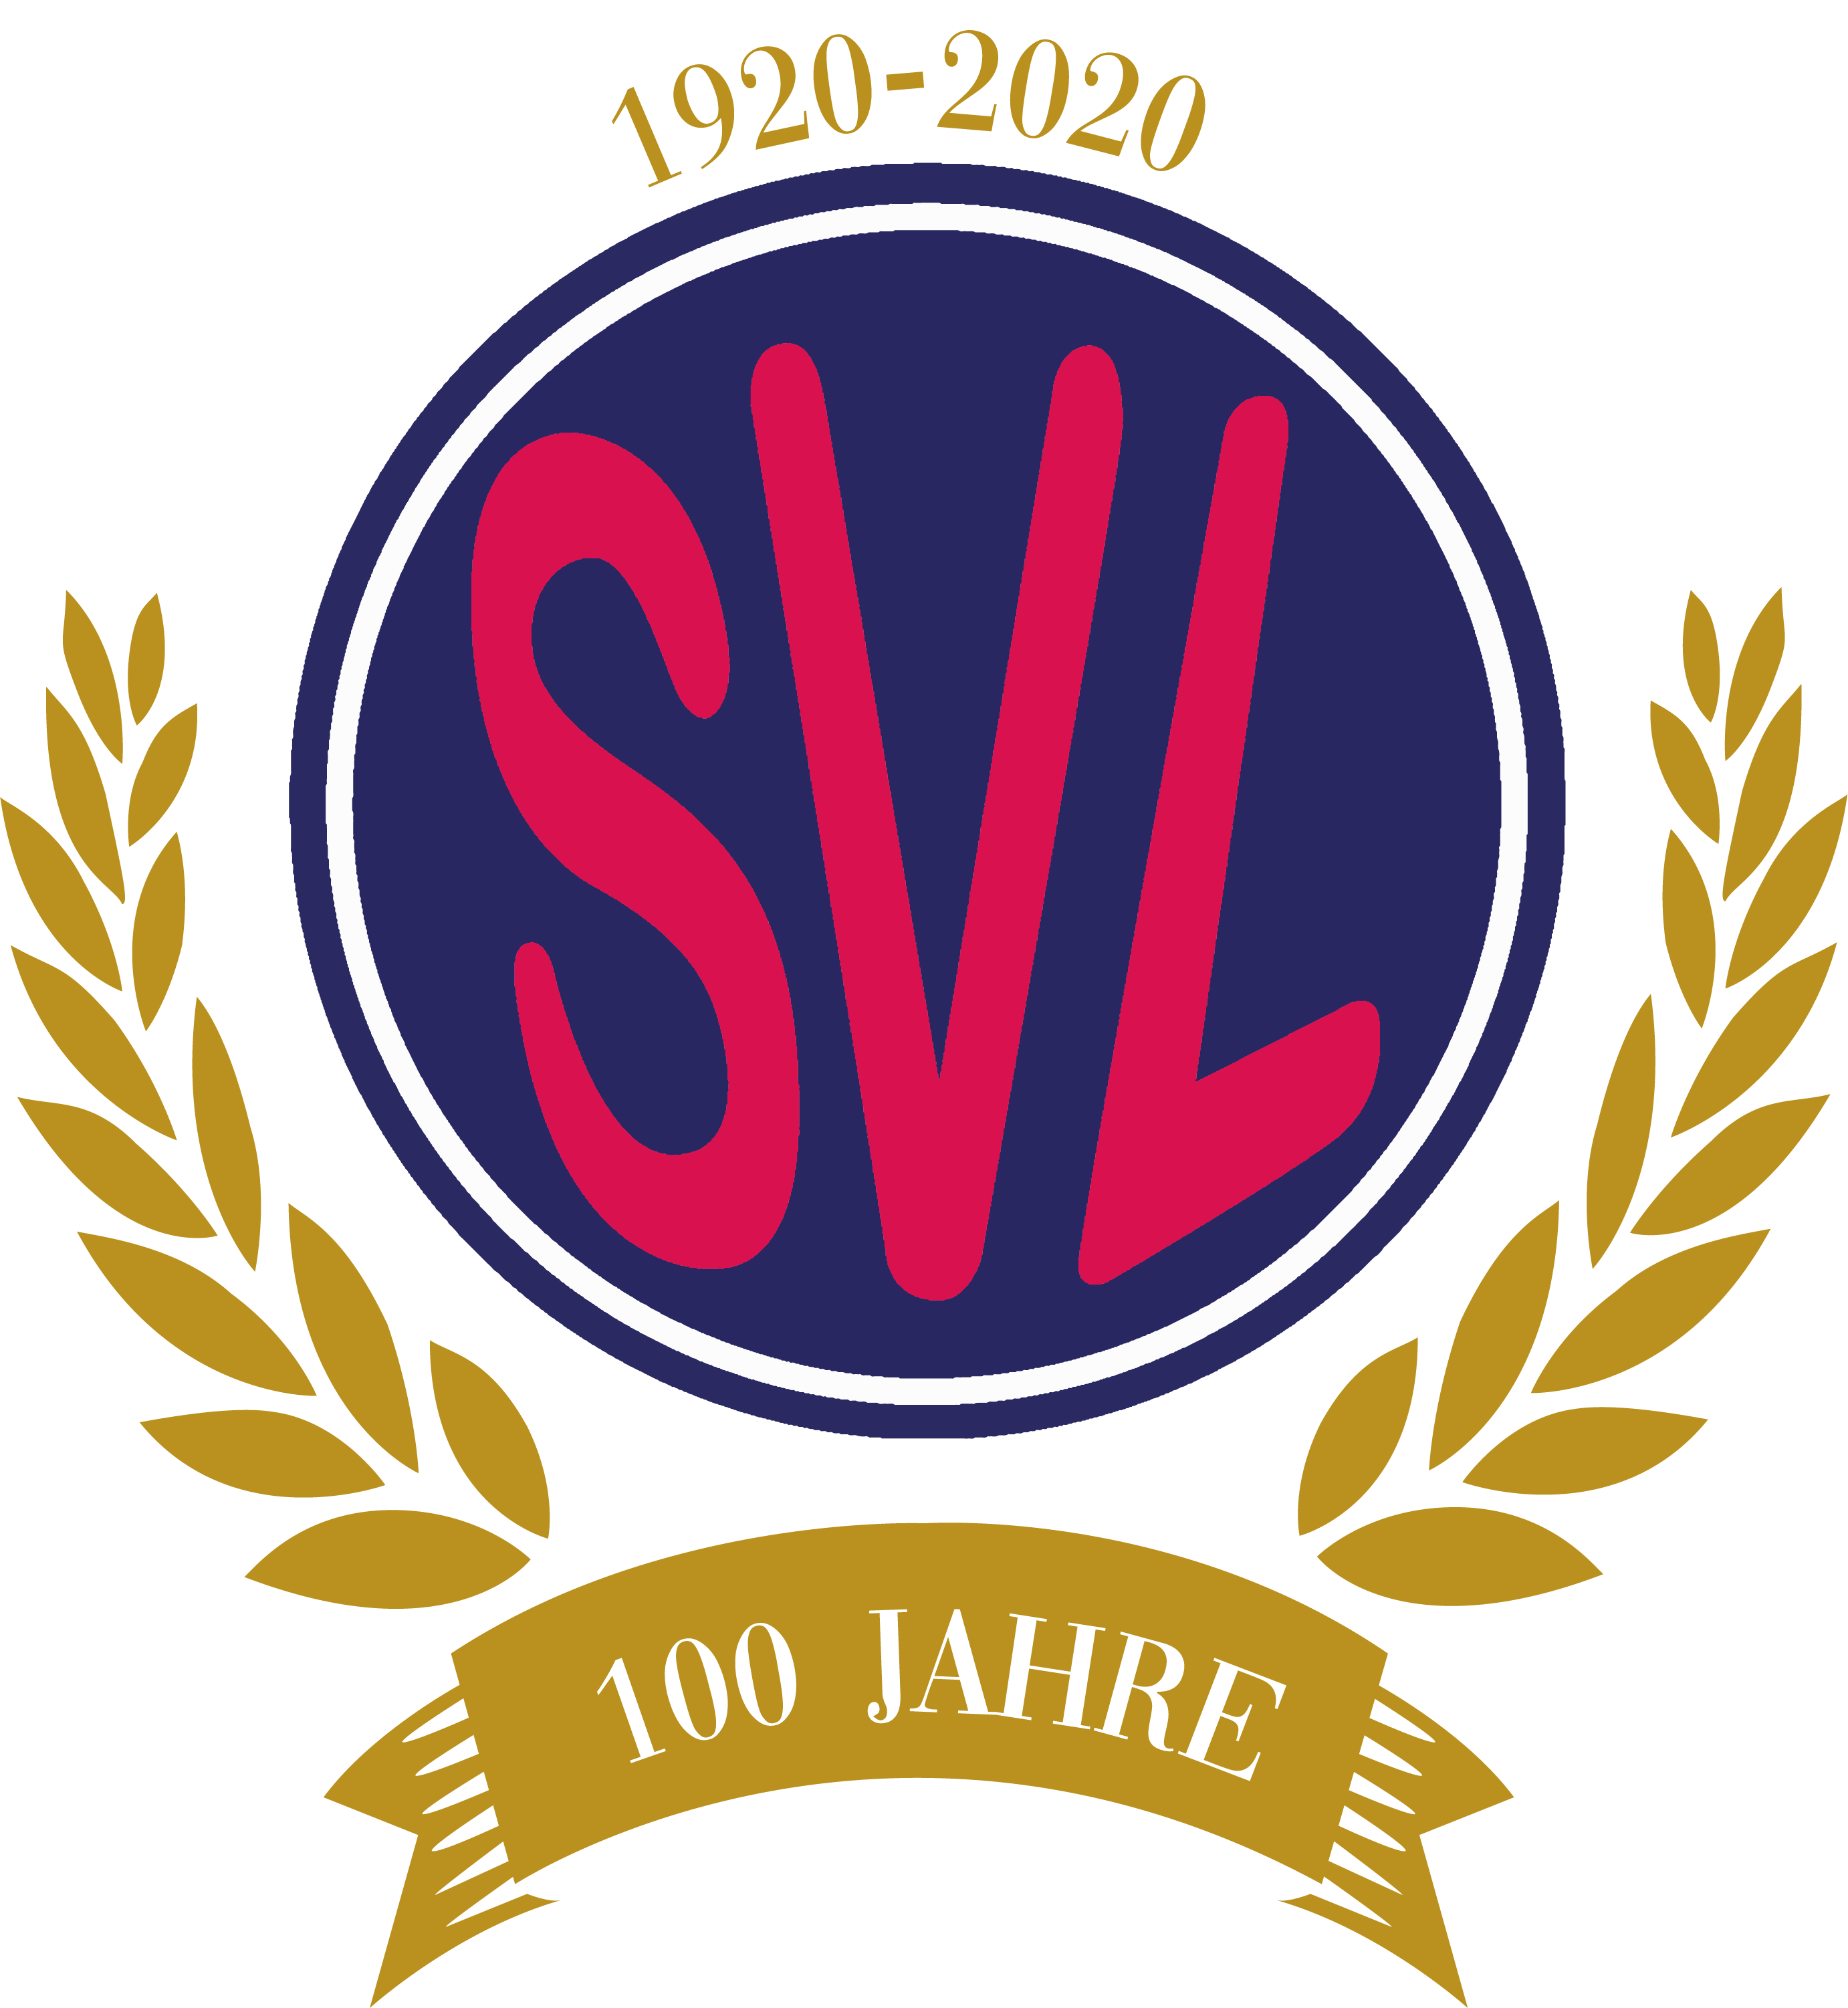 SV Leiberstung